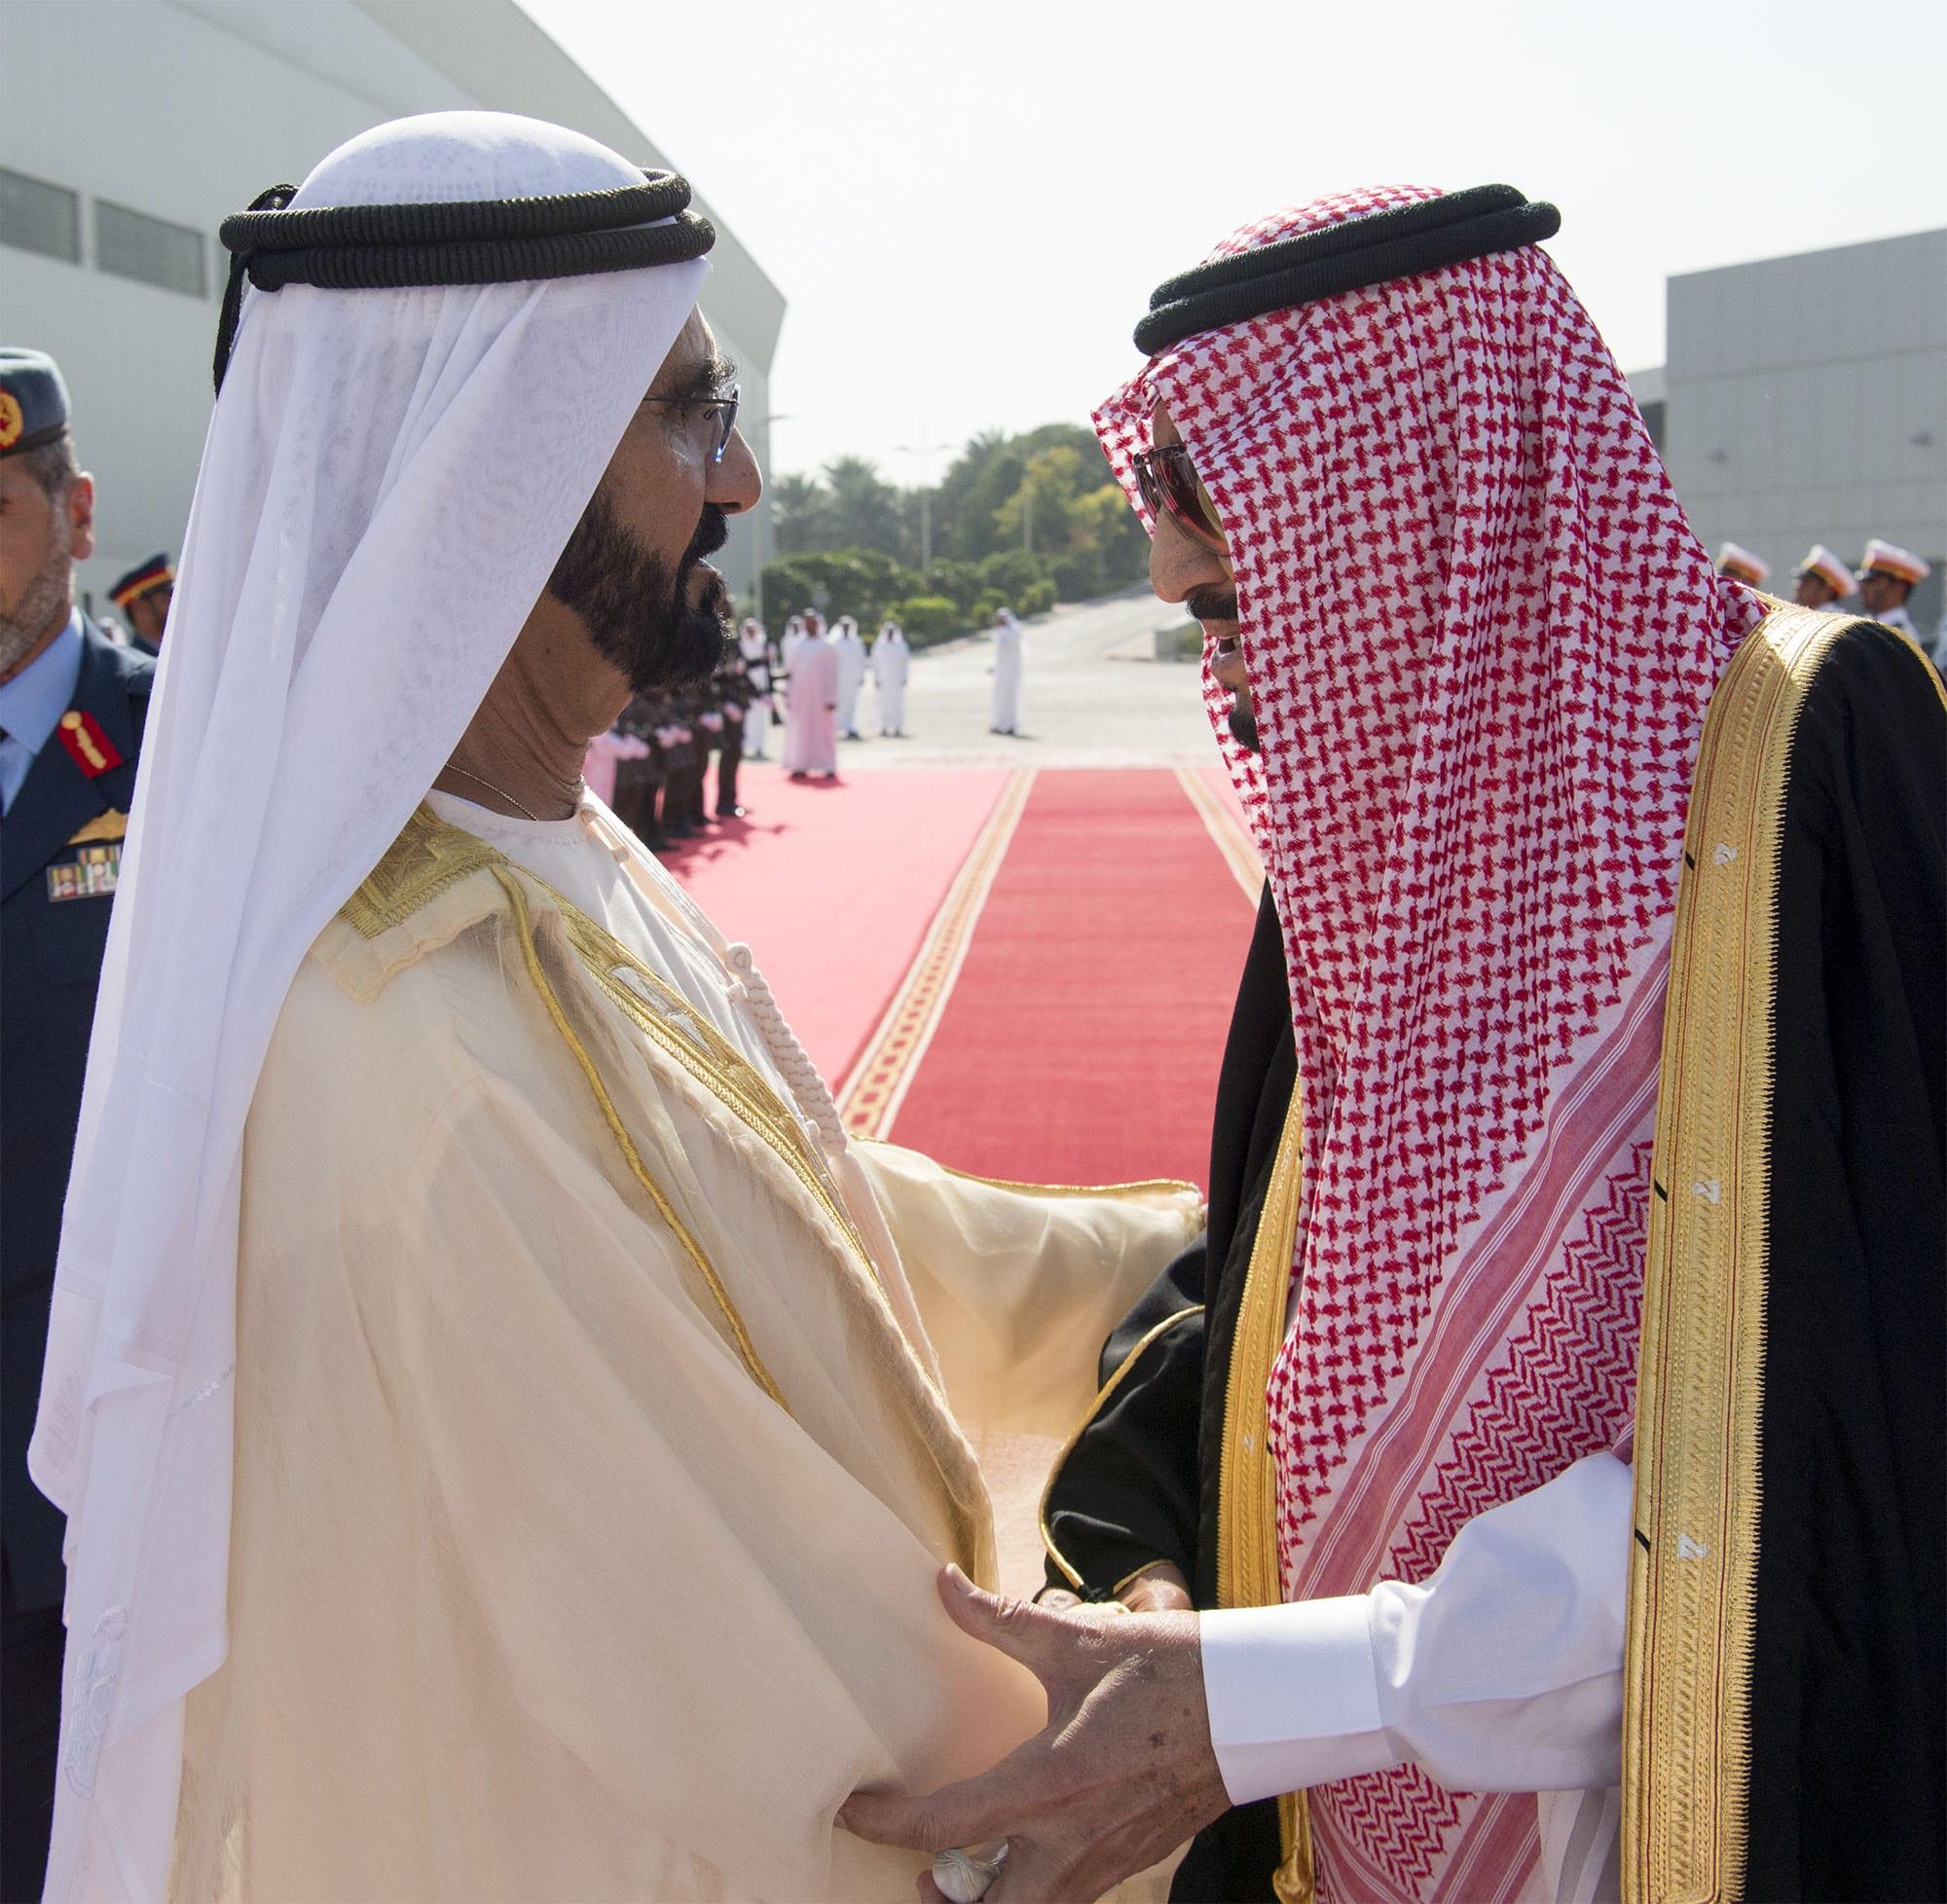 Saudi Arabia vows to stabilize global energy market